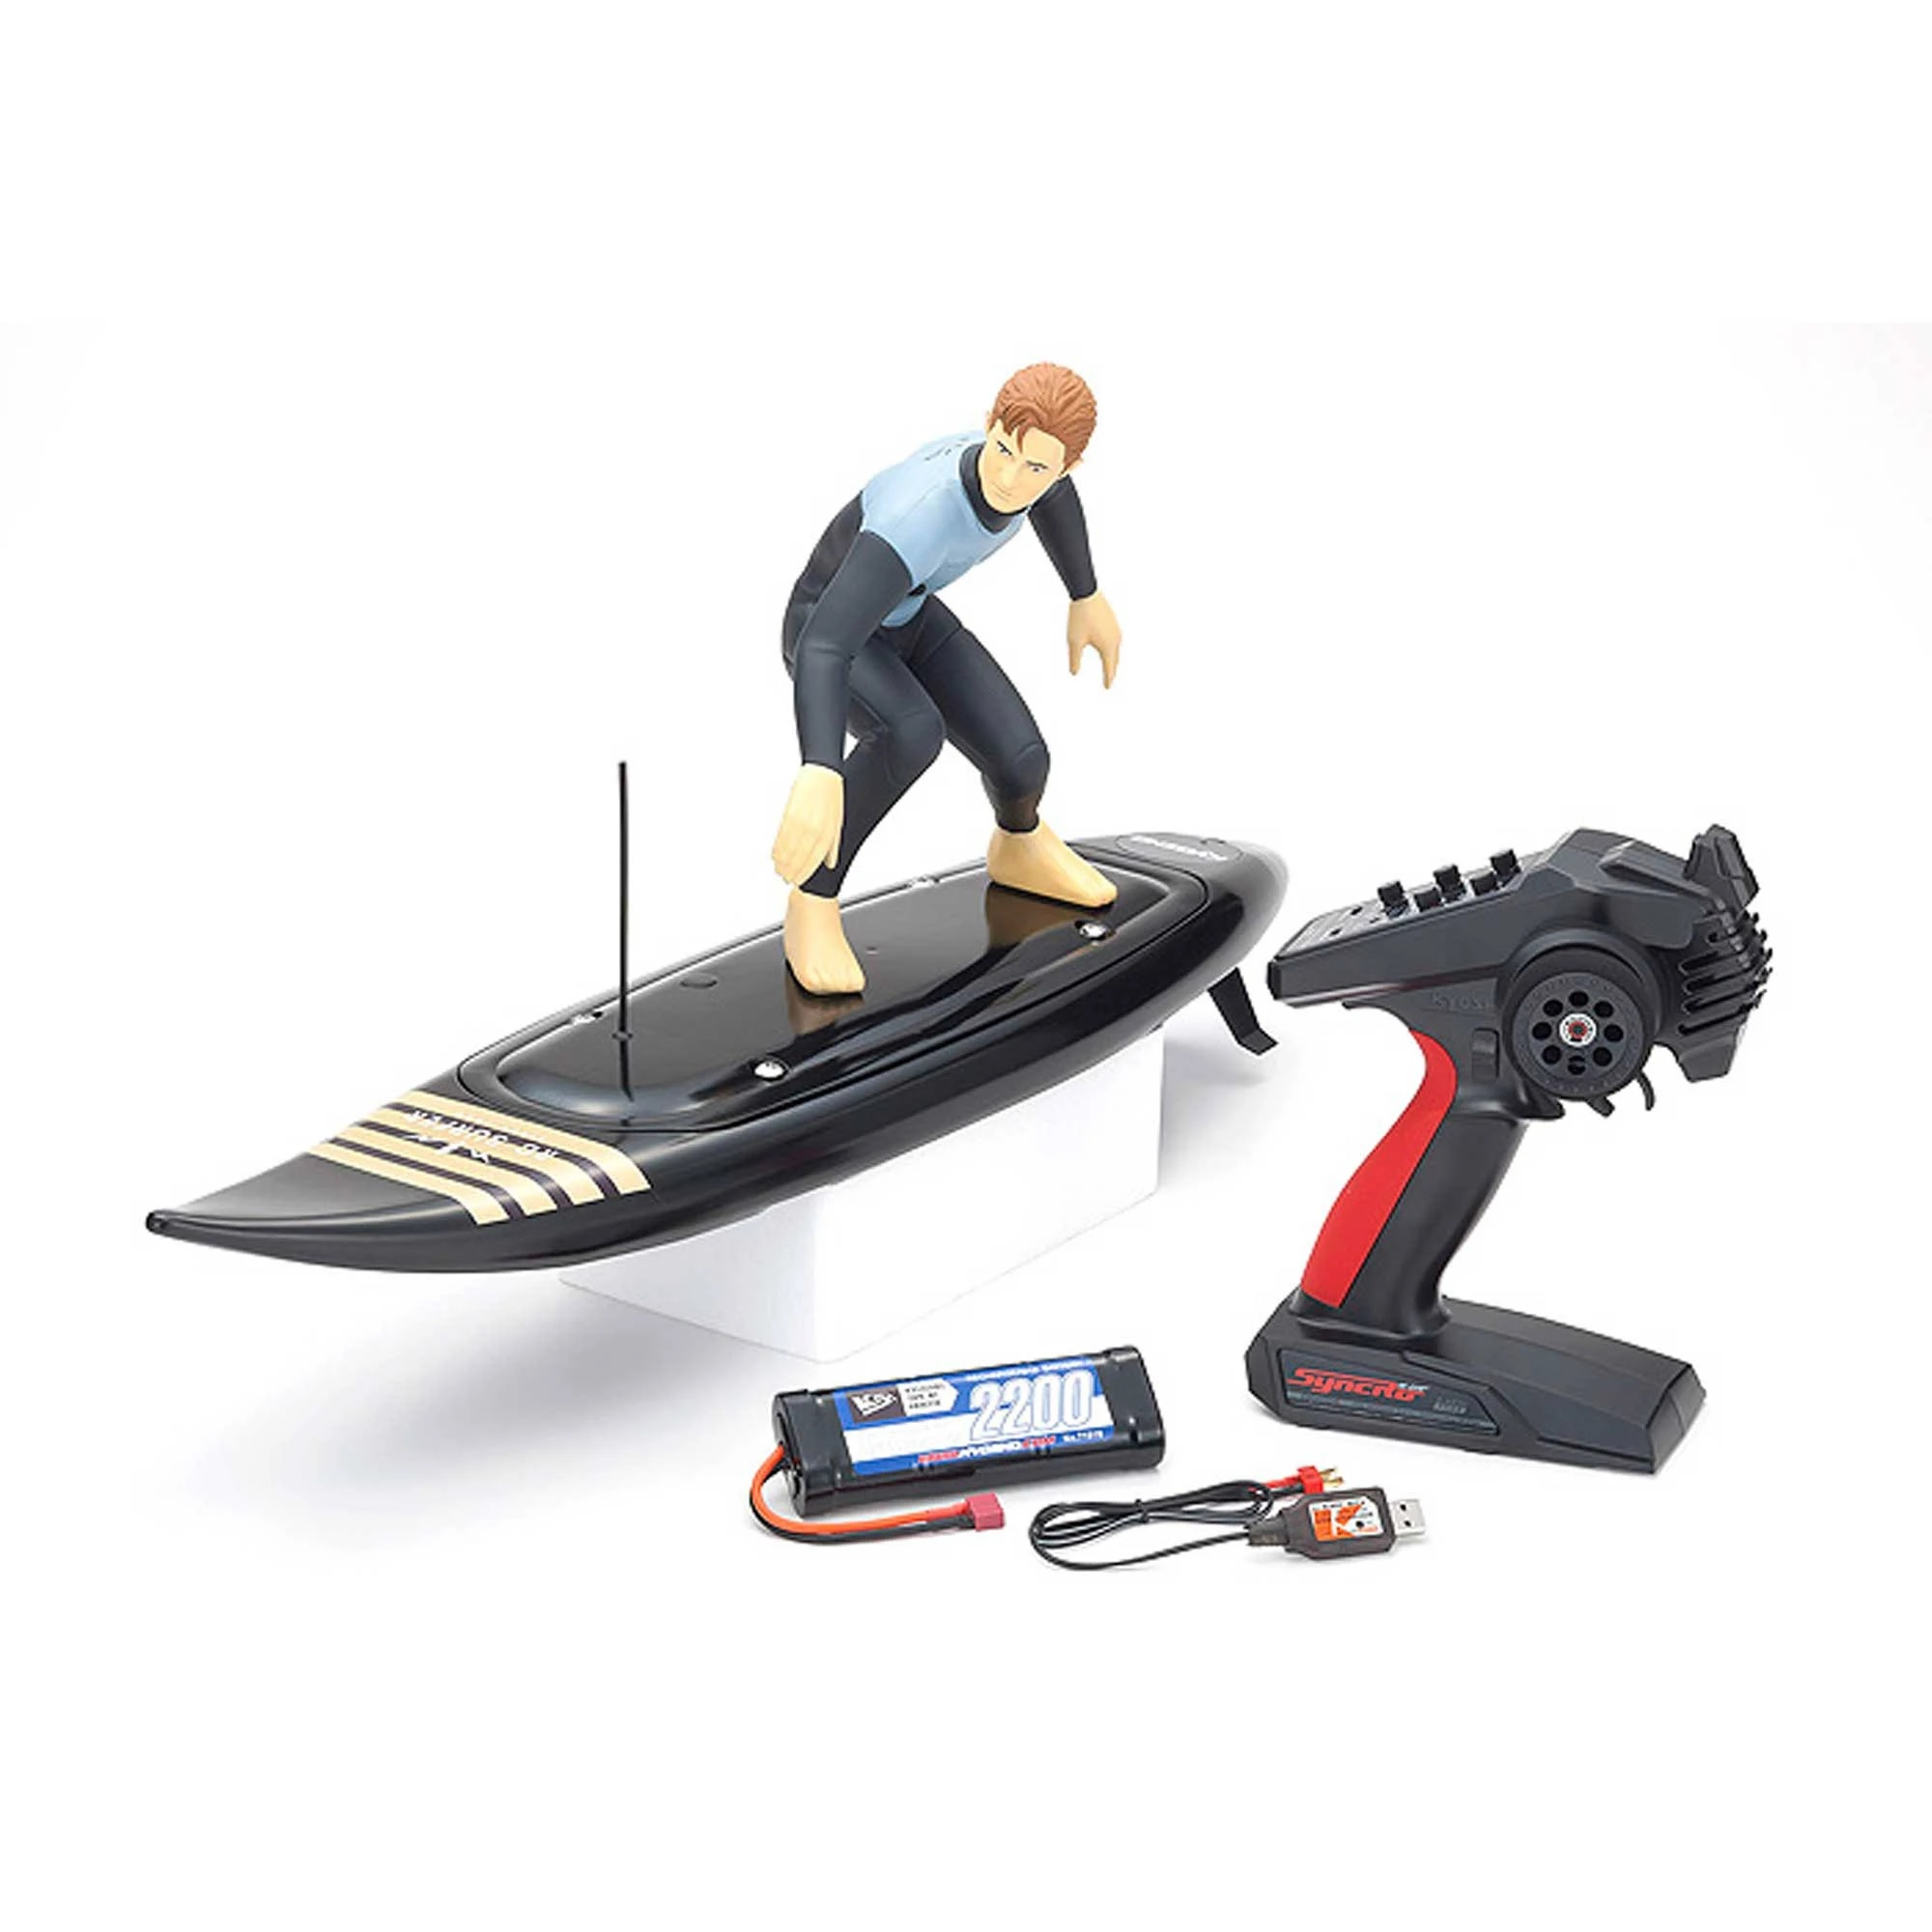 RC Surfer 4 Black